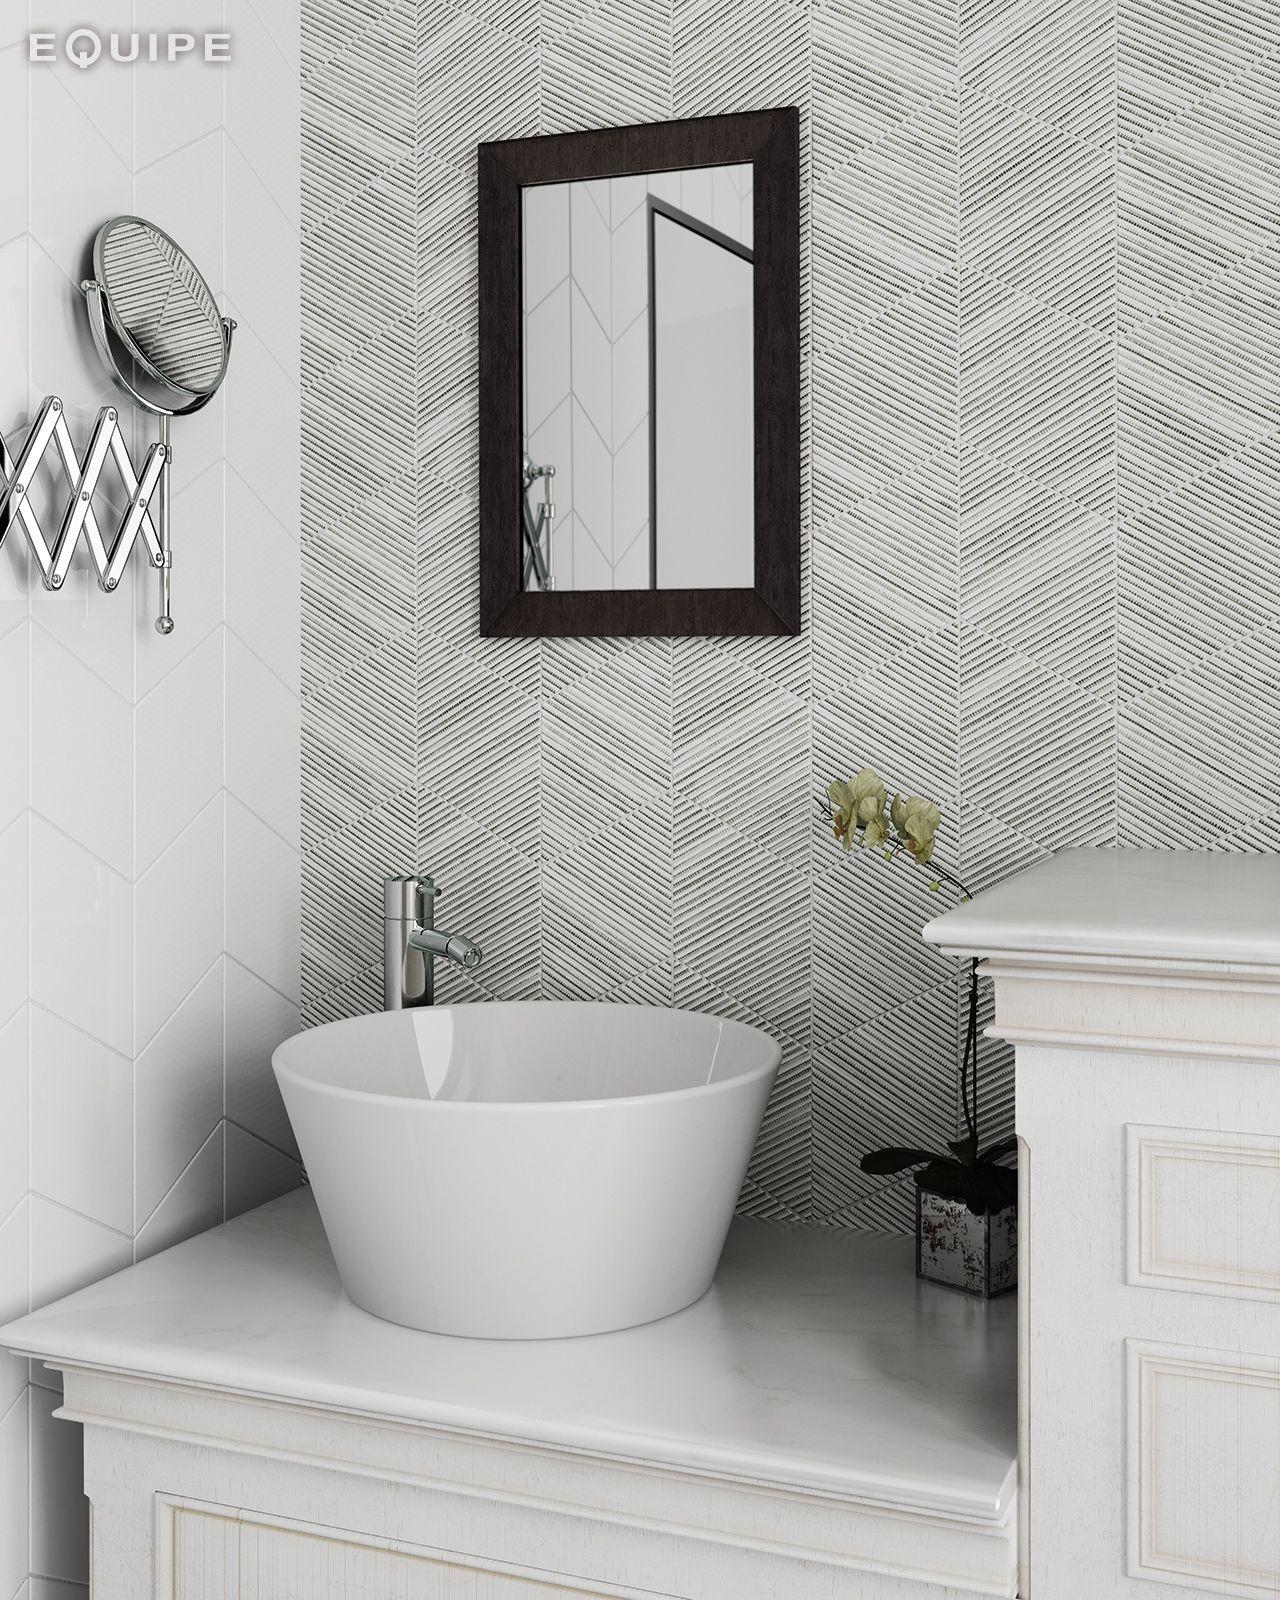 Rhombus Wall White, Decor Bamb B&W 15,2X26,3 #Modern, Rhombus Tilegeometric